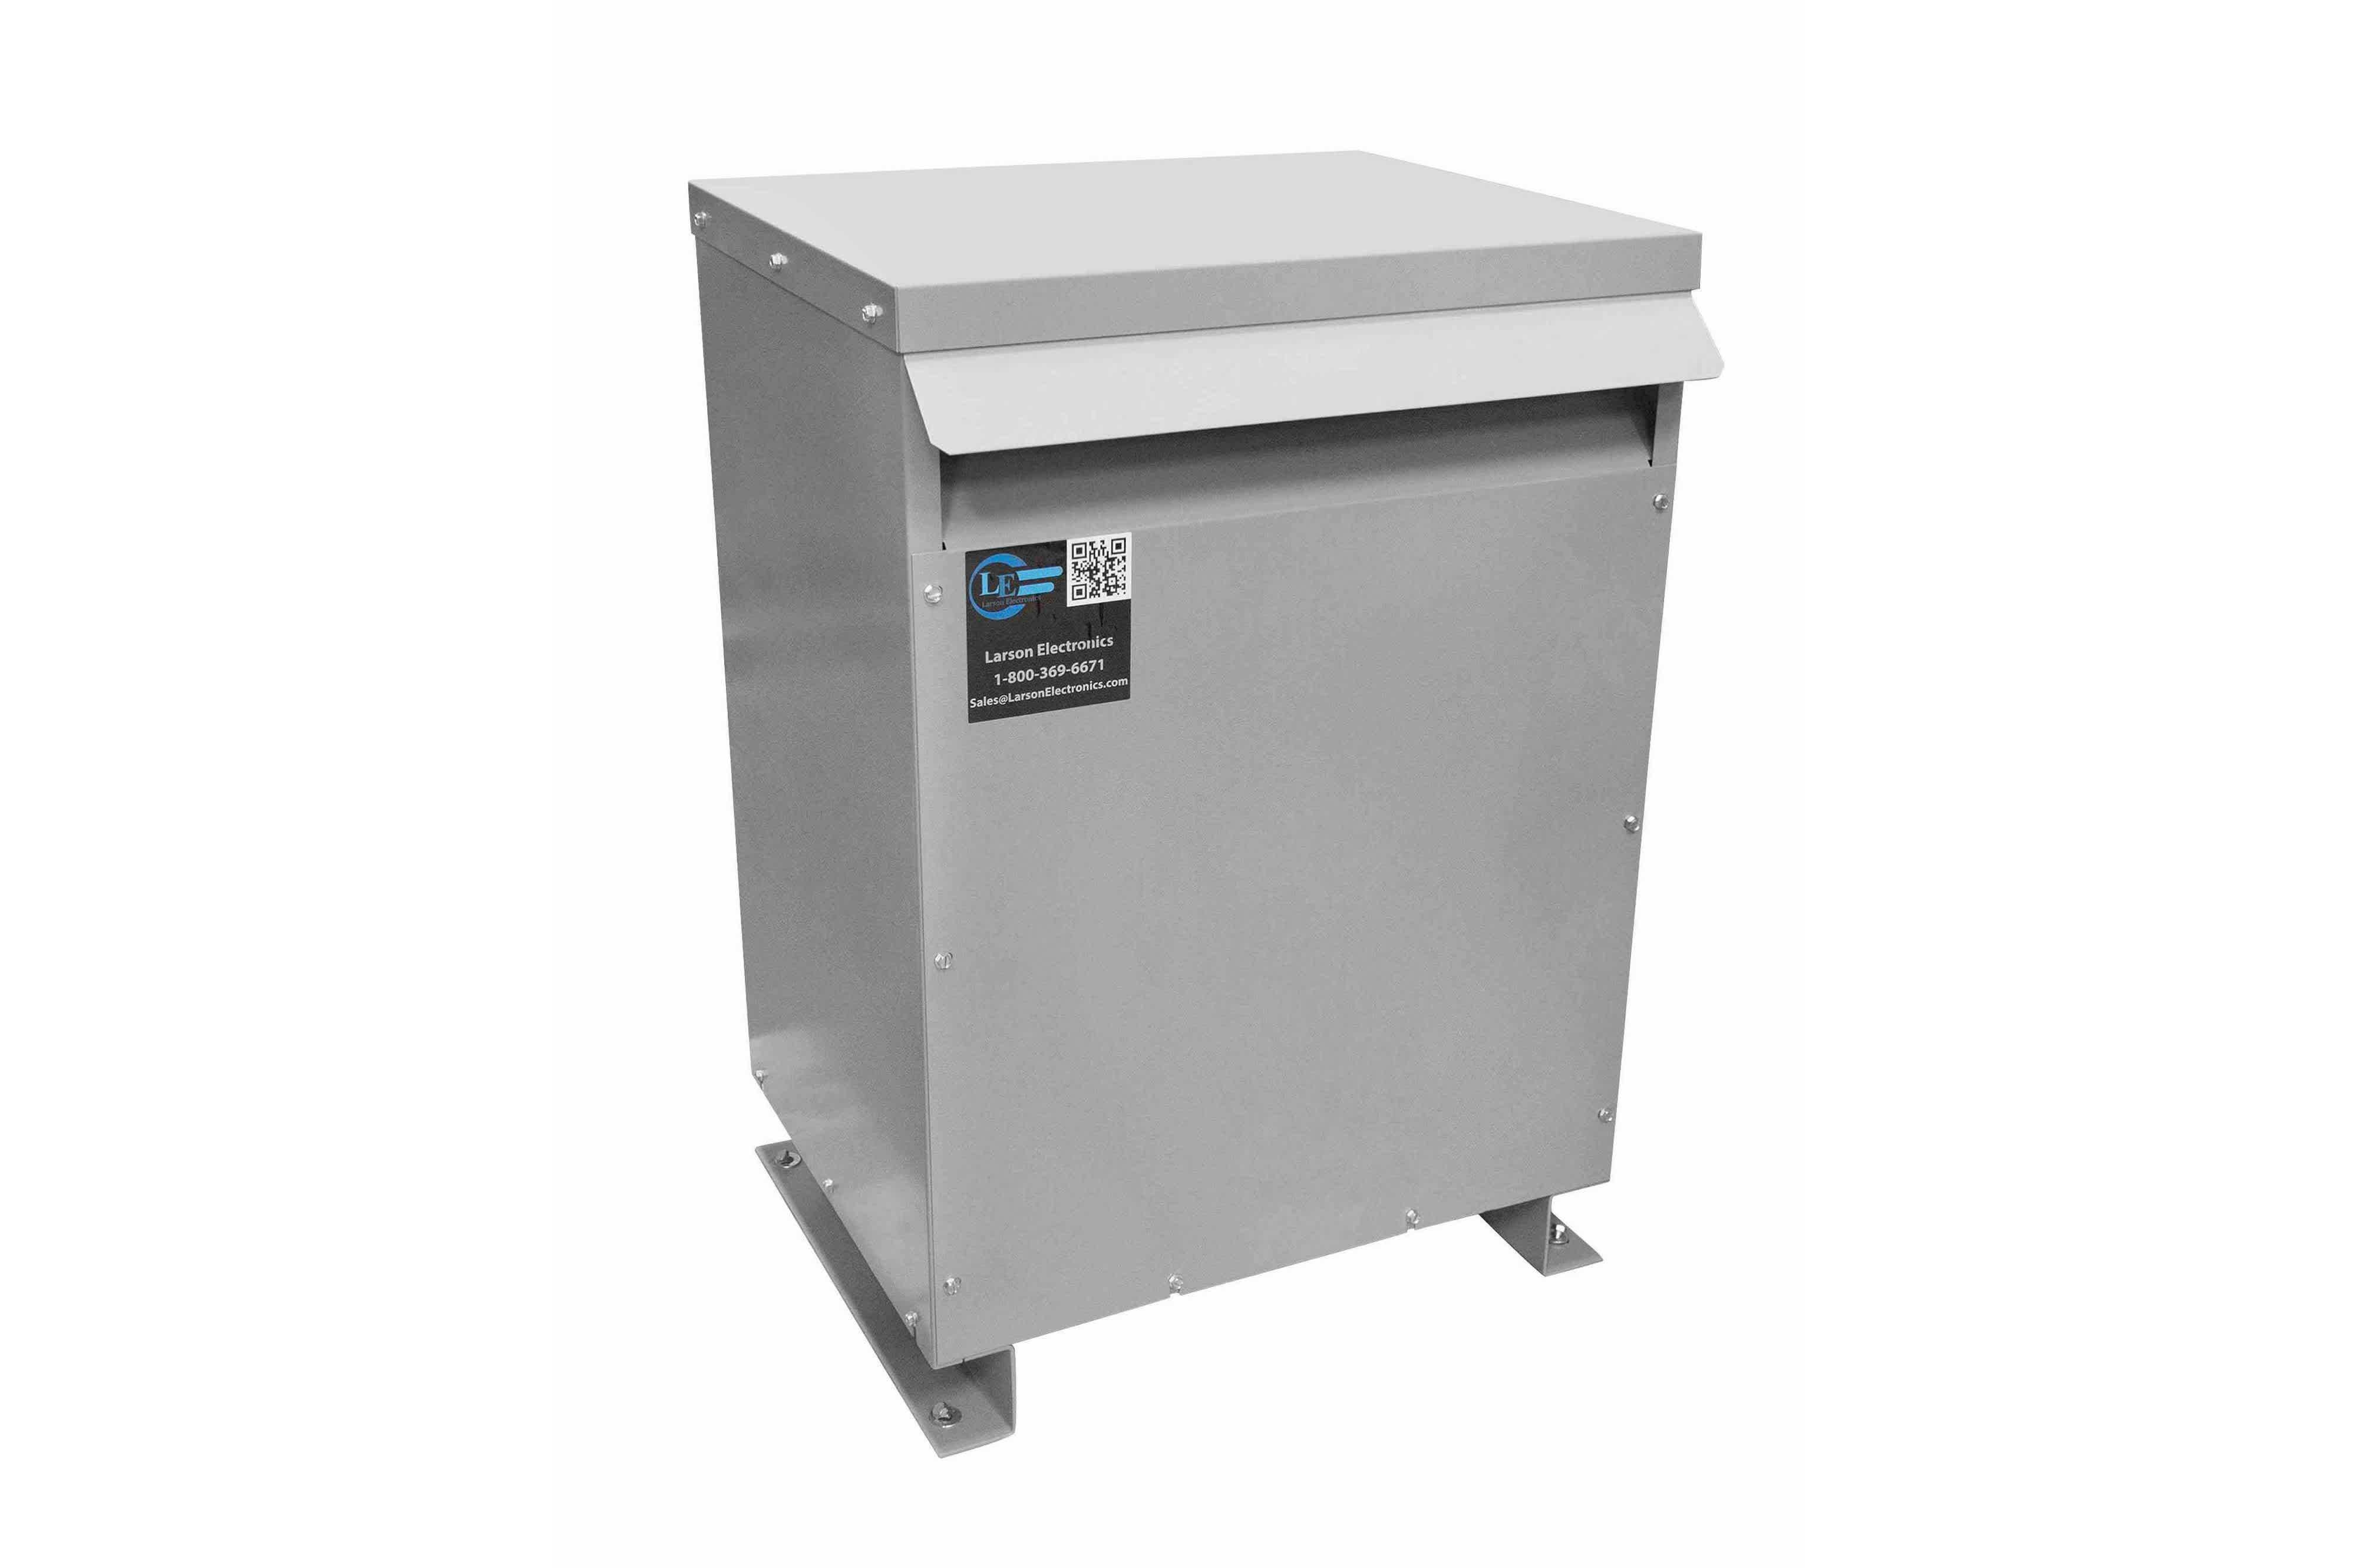 167 kVA 3PH DOE Transformer, 600V Delta Primary, 208Y/120 Wye-N Secondary, N3R, Ventilated, 60 Hz